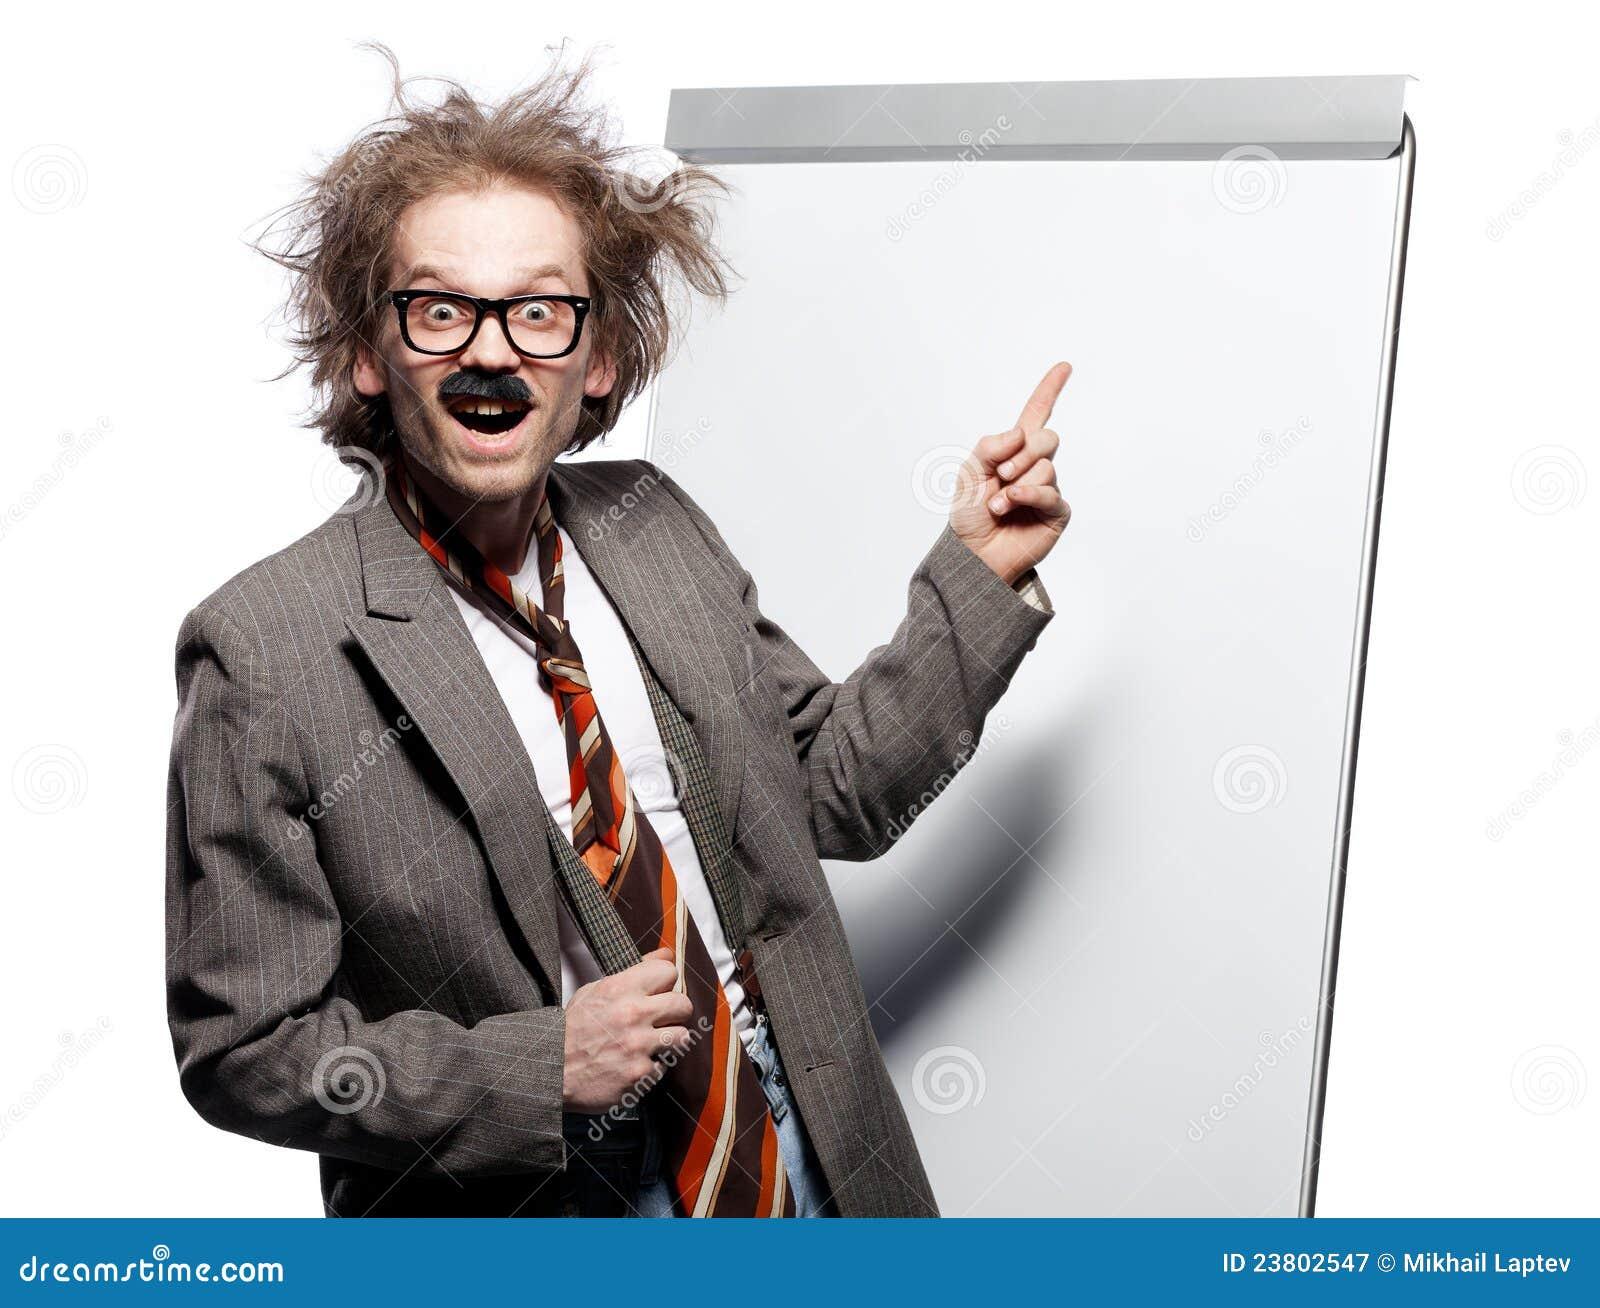 Crazy Professor Stock Image Image Of Mustache Madman